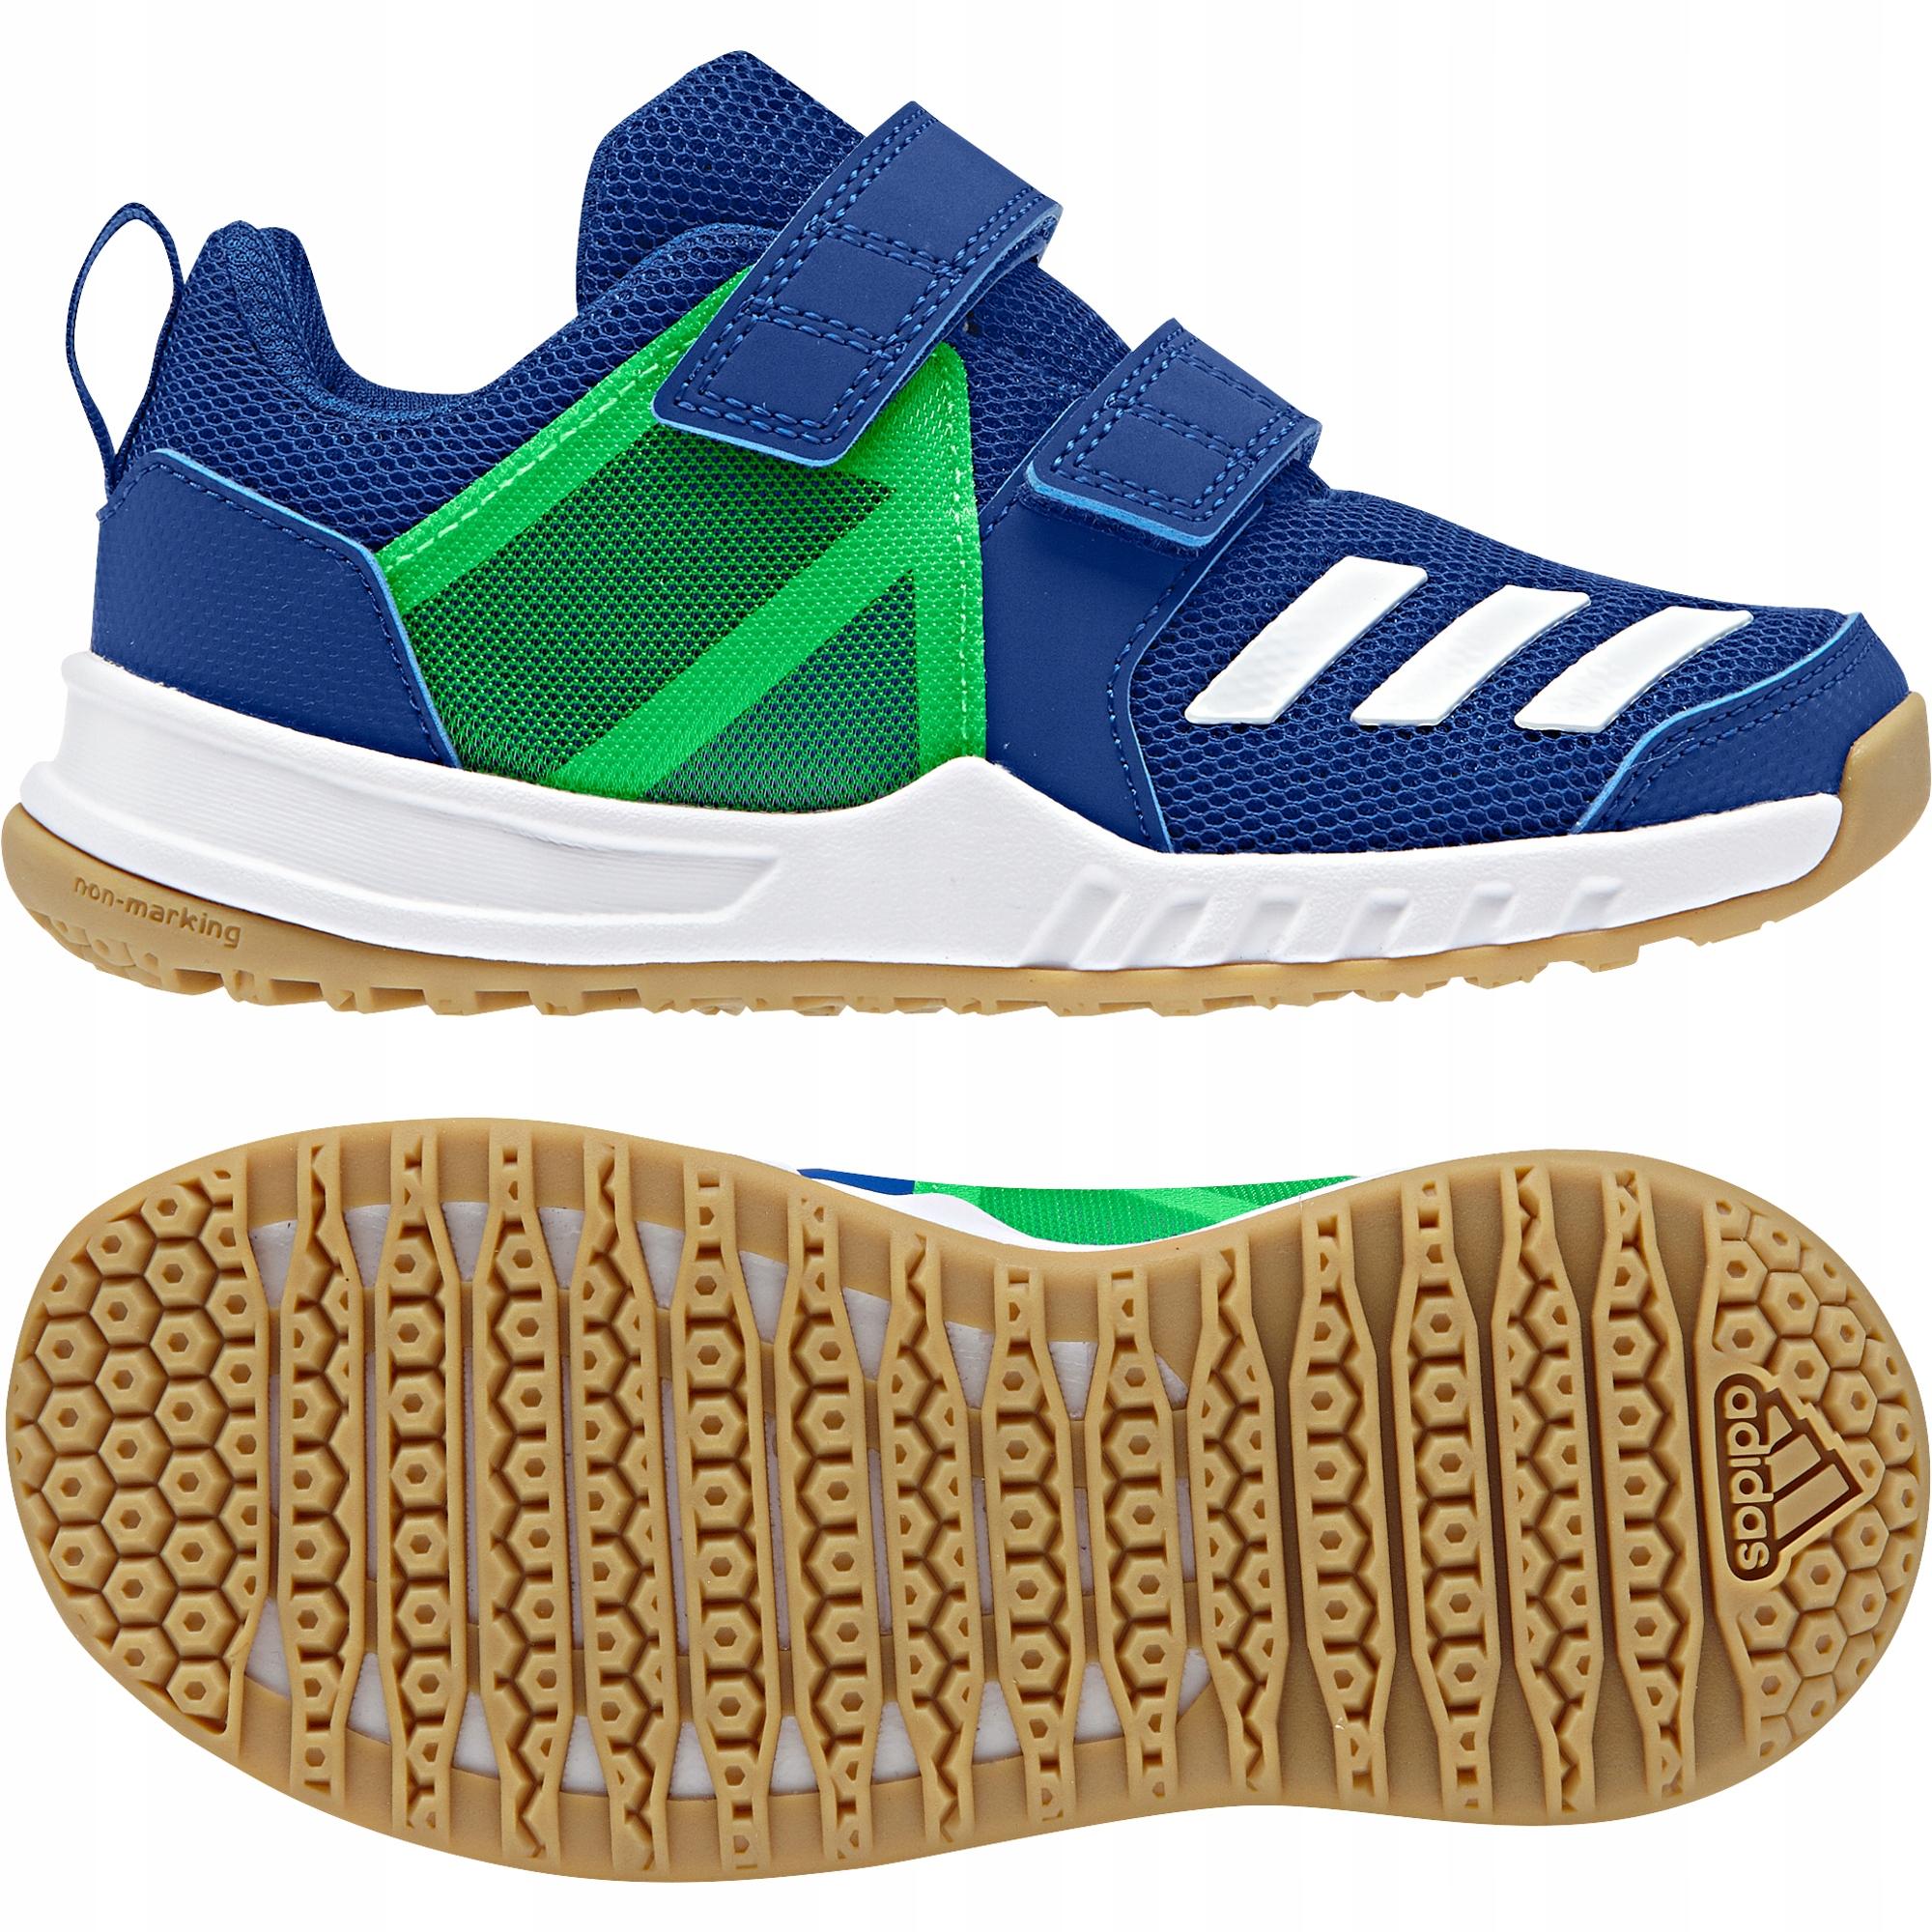 buty dziecięce adidas FortaGym r 35 AH2562